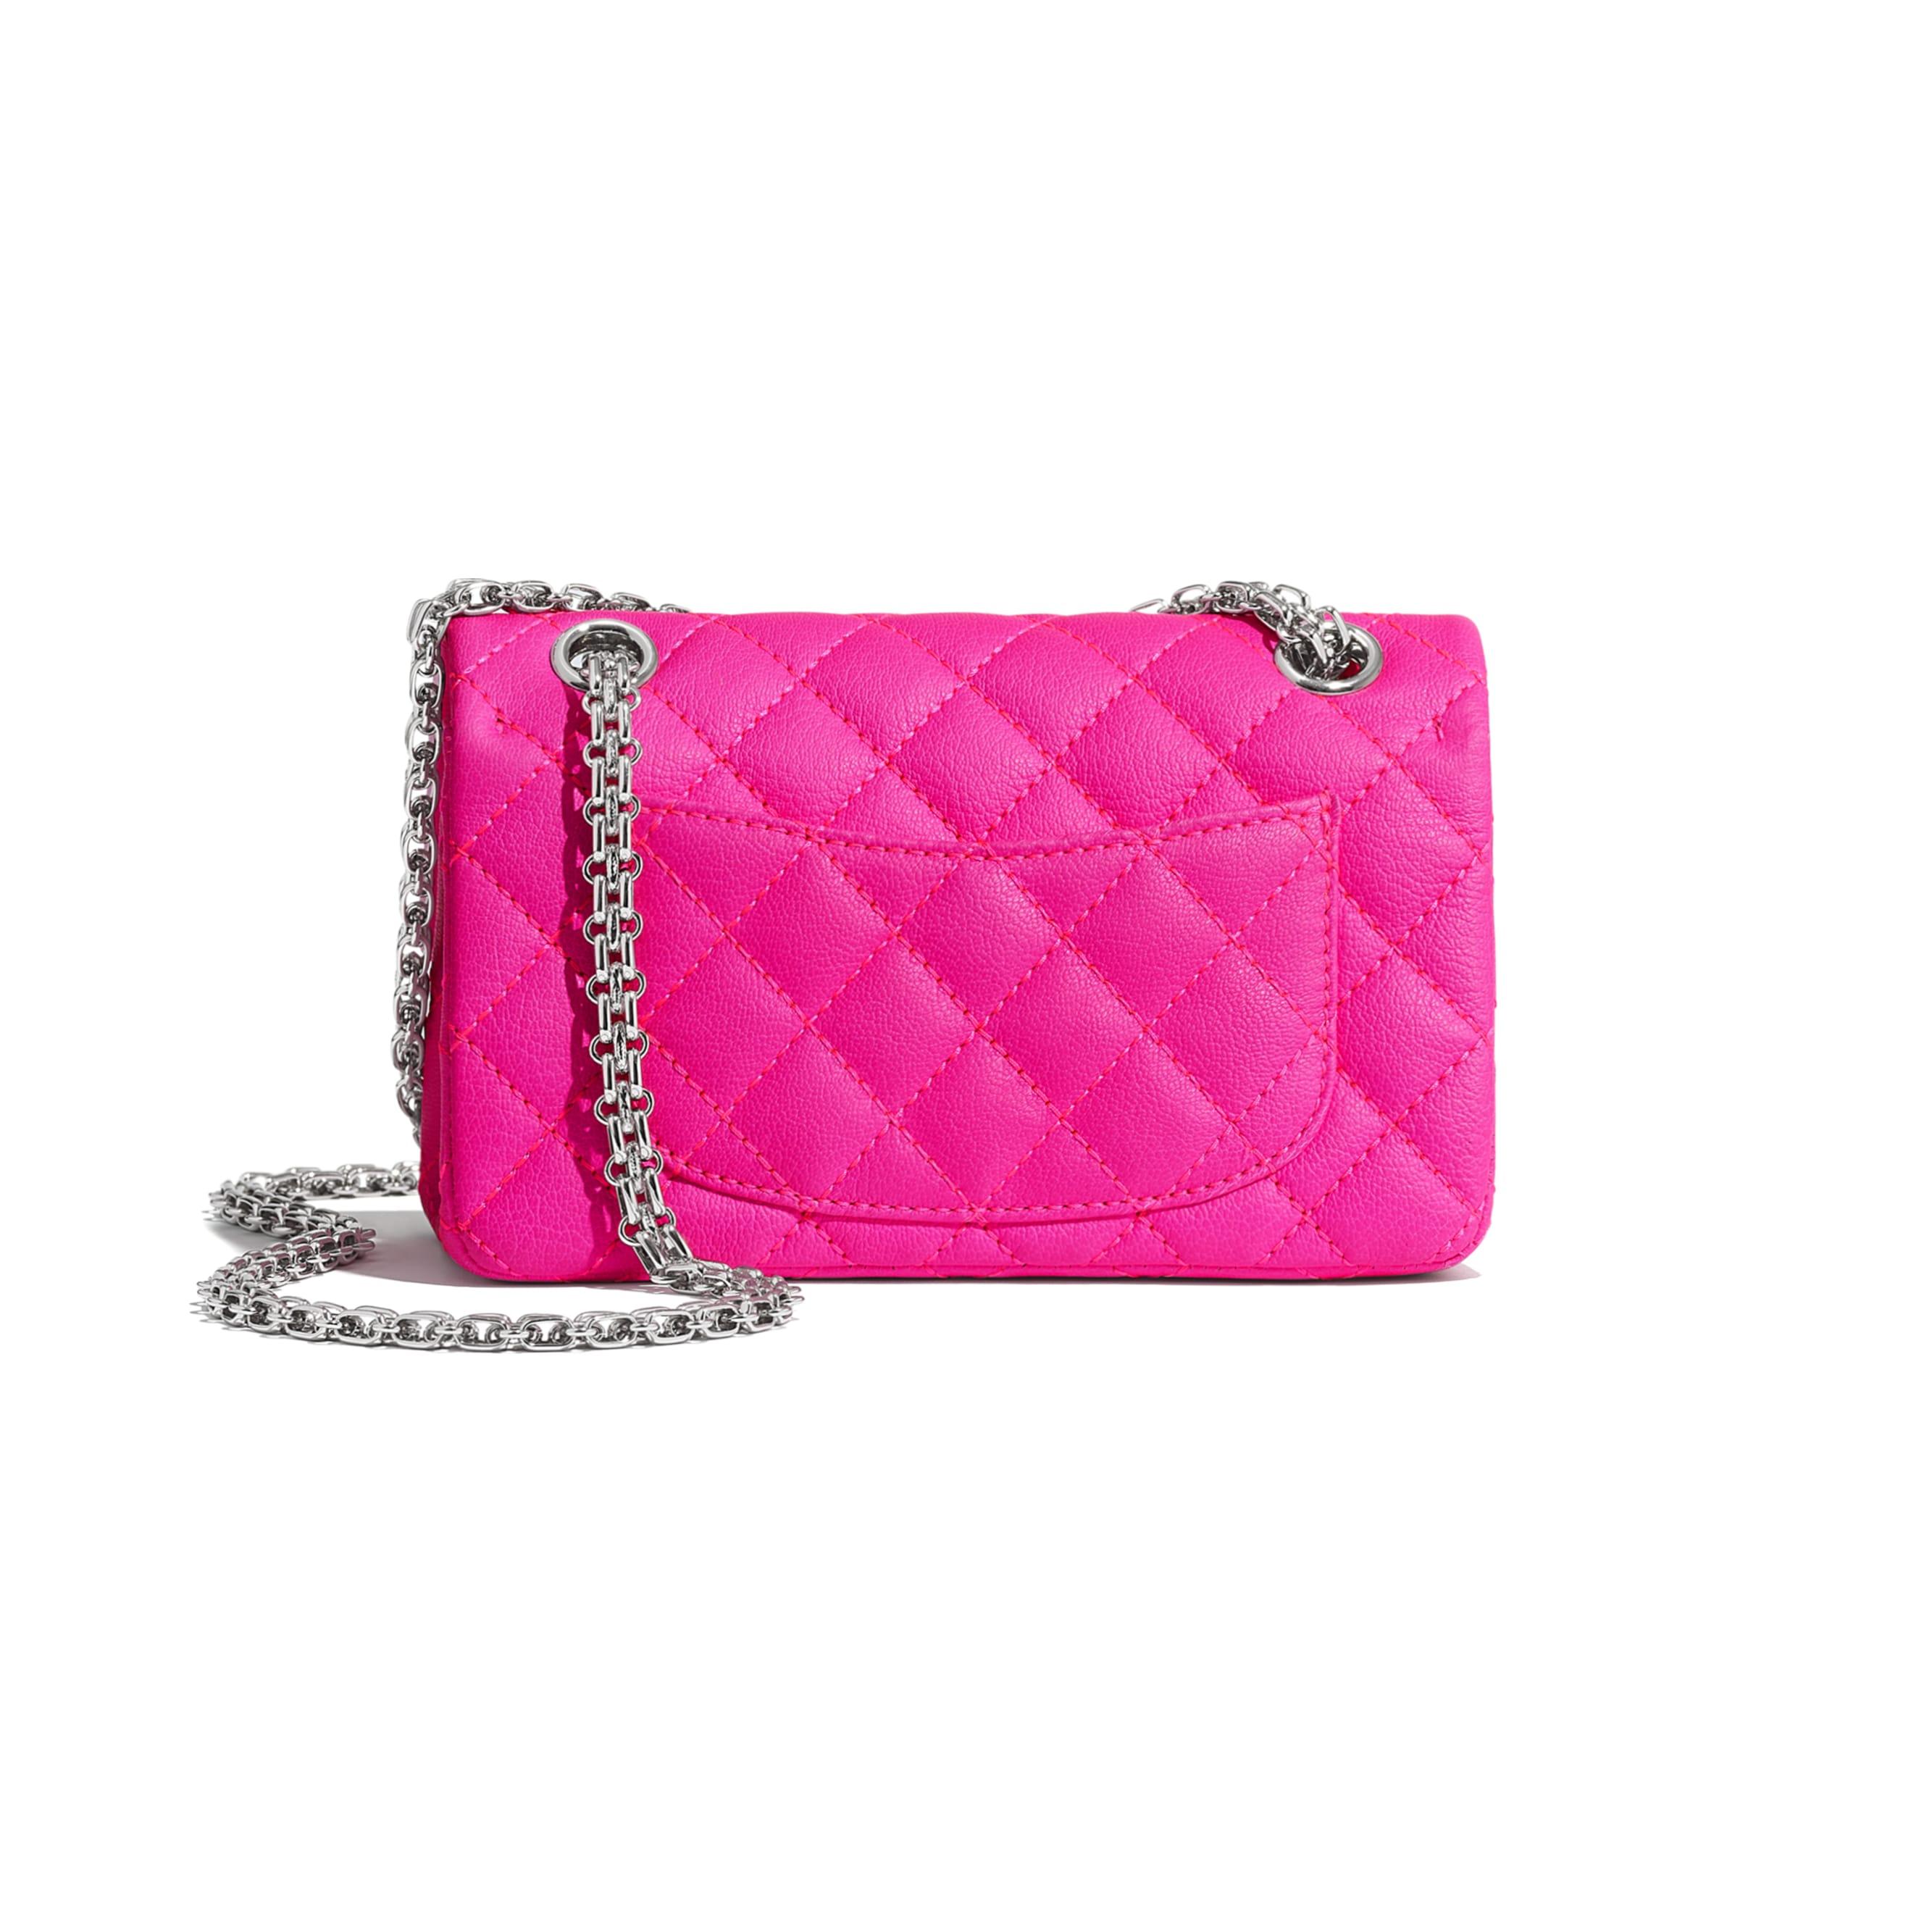 Mini 2.55 Handbag - Pink - Goatskin & Silver-Tone Metal - CHANEL - Alternative view - see standard sized version